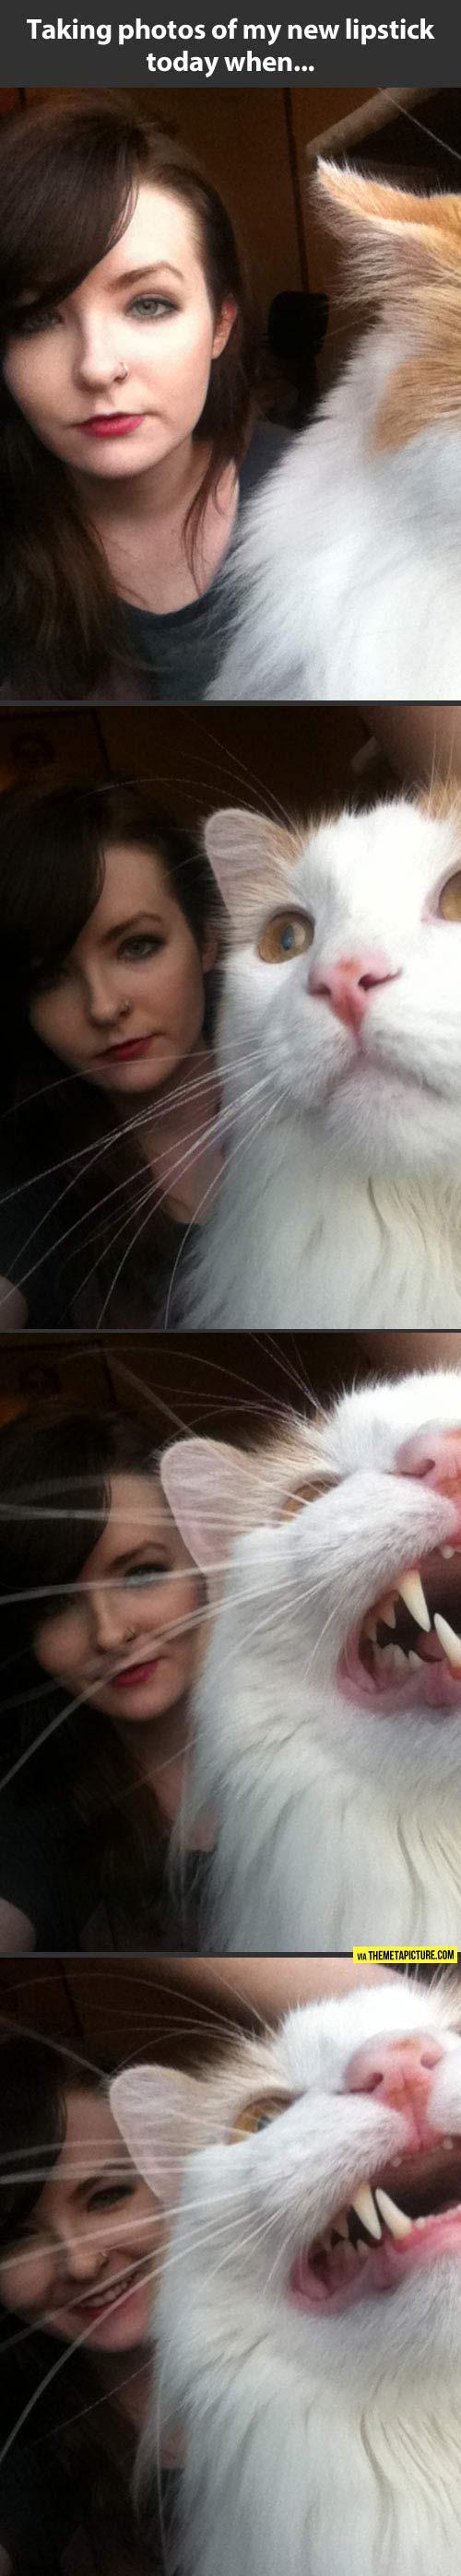 funny-girl-lipstick-cat-cam